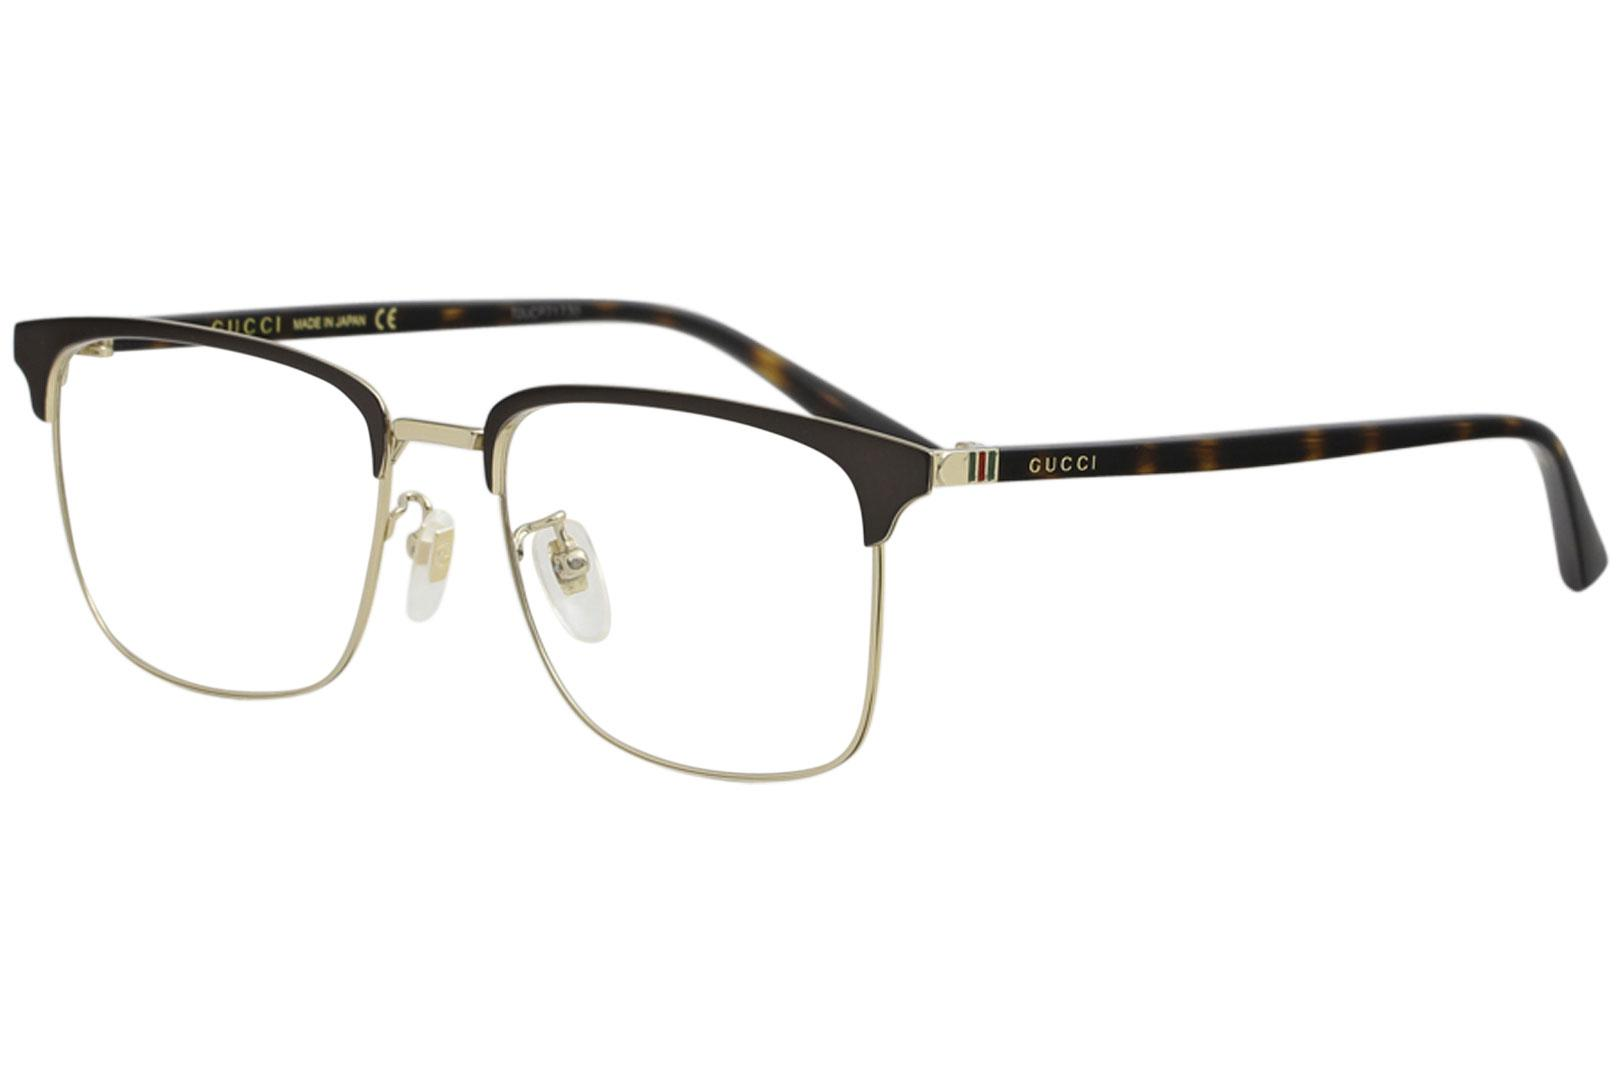 185b829cf073 Gucci Men s Eyeglasses GG0130O GG 0130 O Full Rim Optical Frame by Gucci